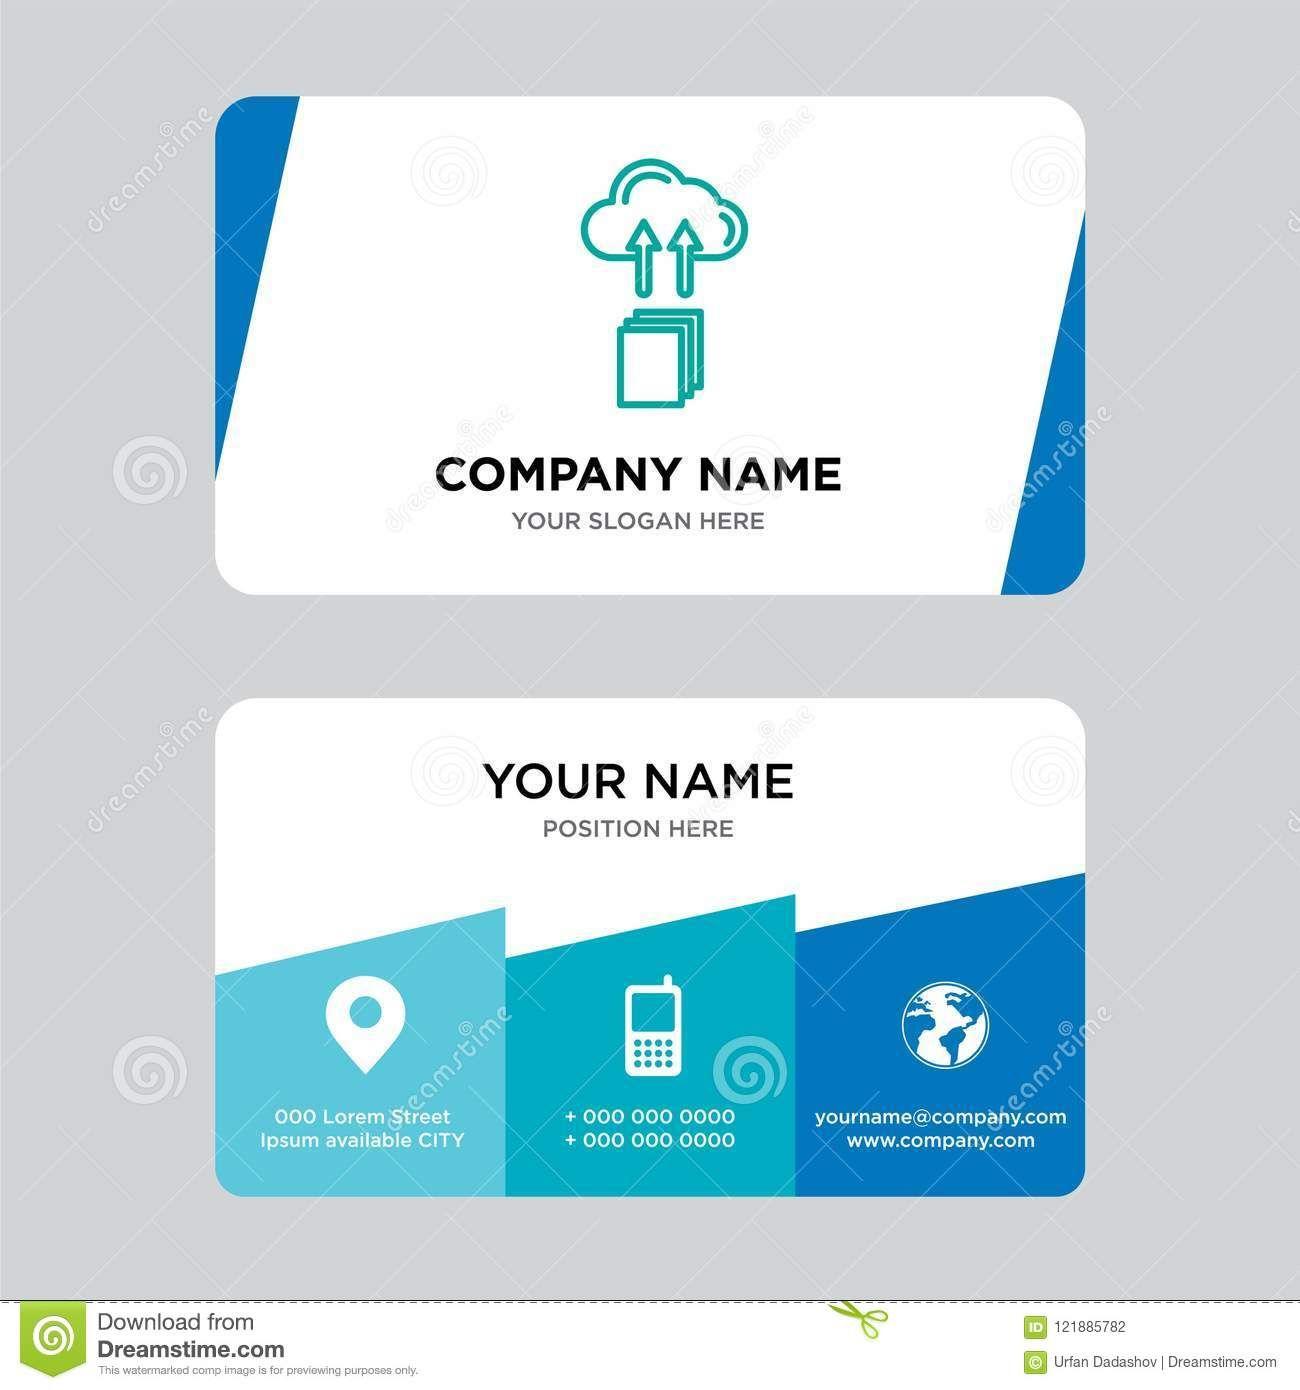 Business Card Design Upload Www Inside Kinkos Business Card Template Professional Tem In 2020 Business Card Template Design Teacher Business Cards Id Card Template